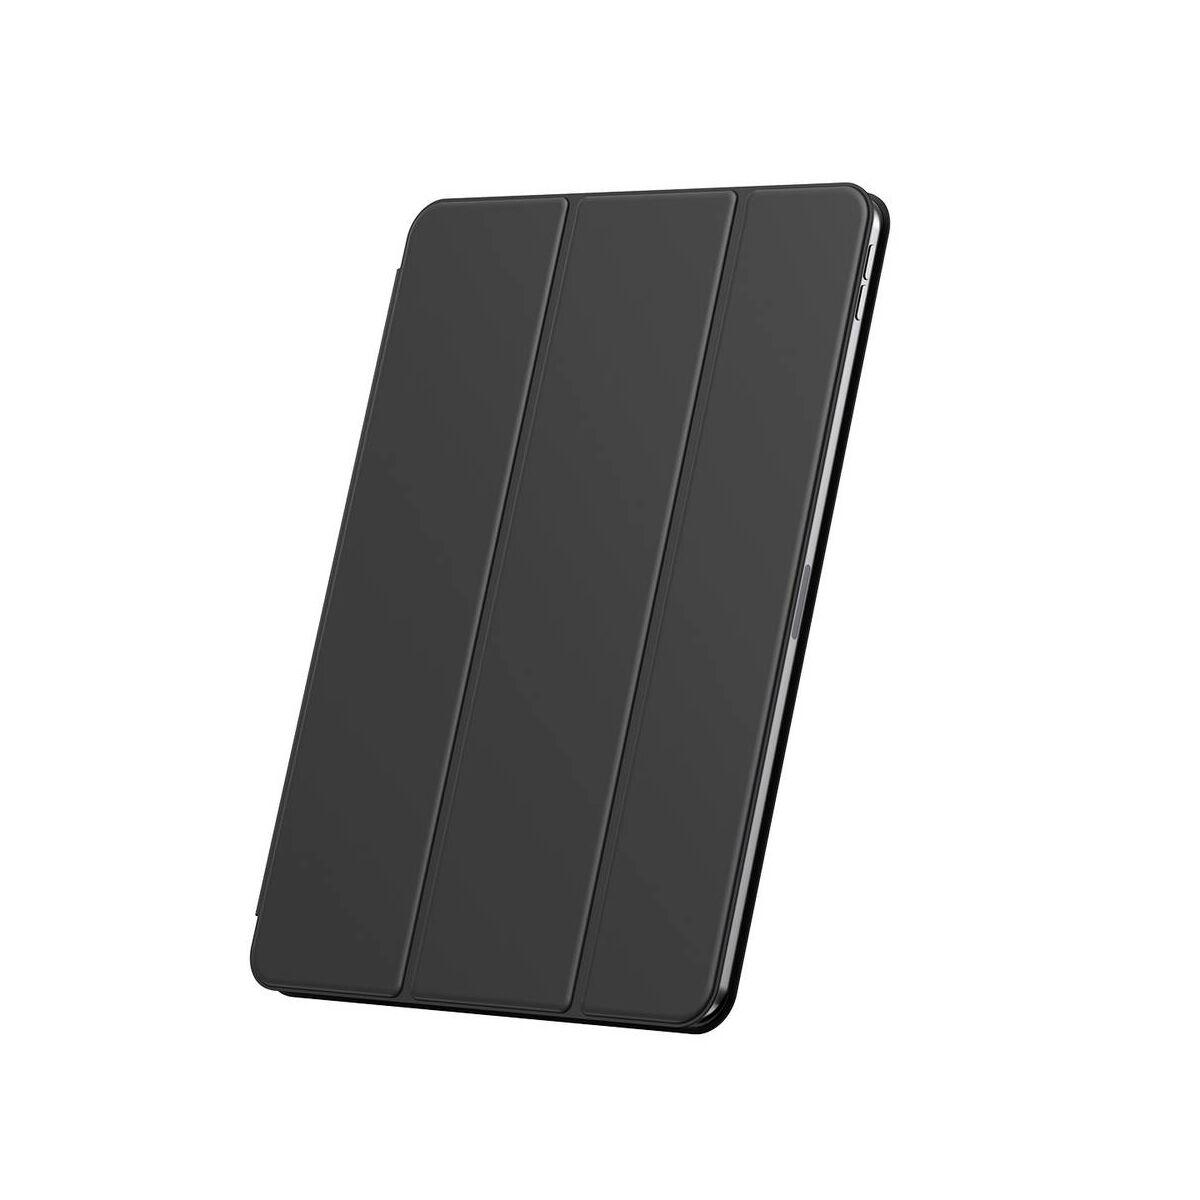 "Baseus iPad Pro 12.9"" tok, Simplism mágneses bőr tok, fekete (LTAPIPD-FSM01)"